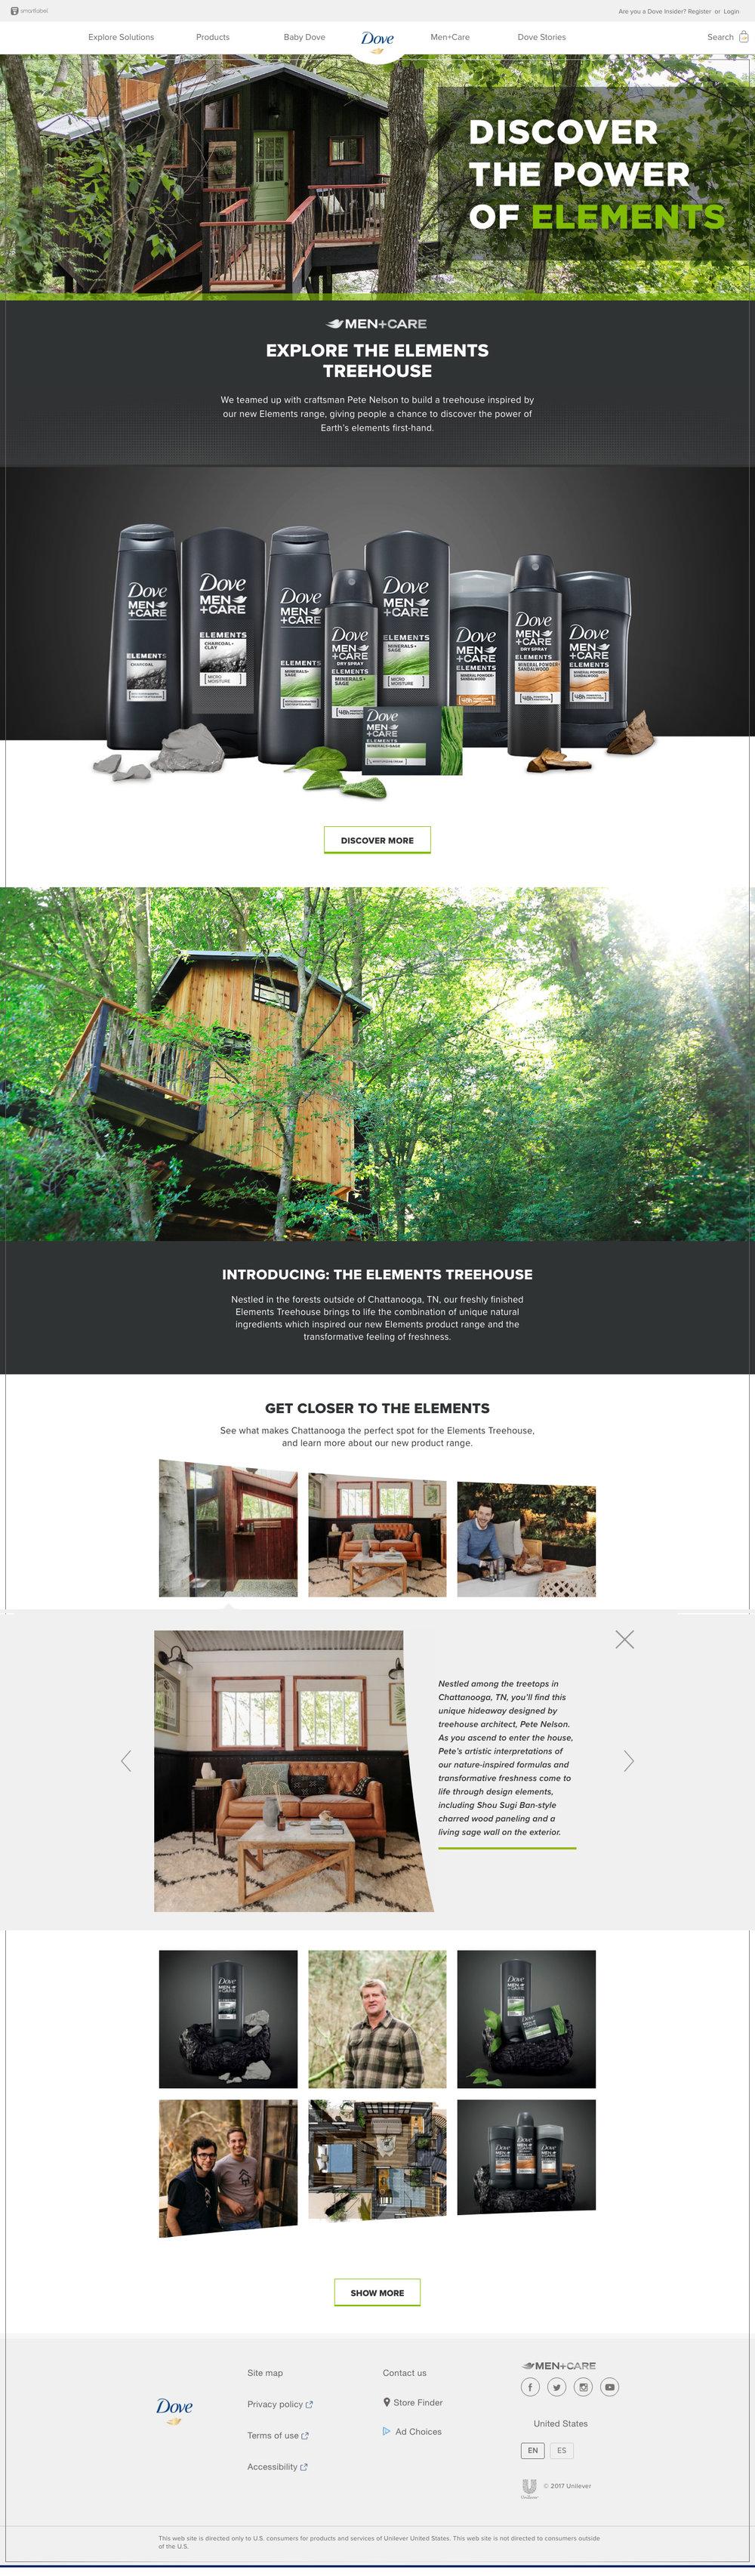 treehouse-psdj.jpg